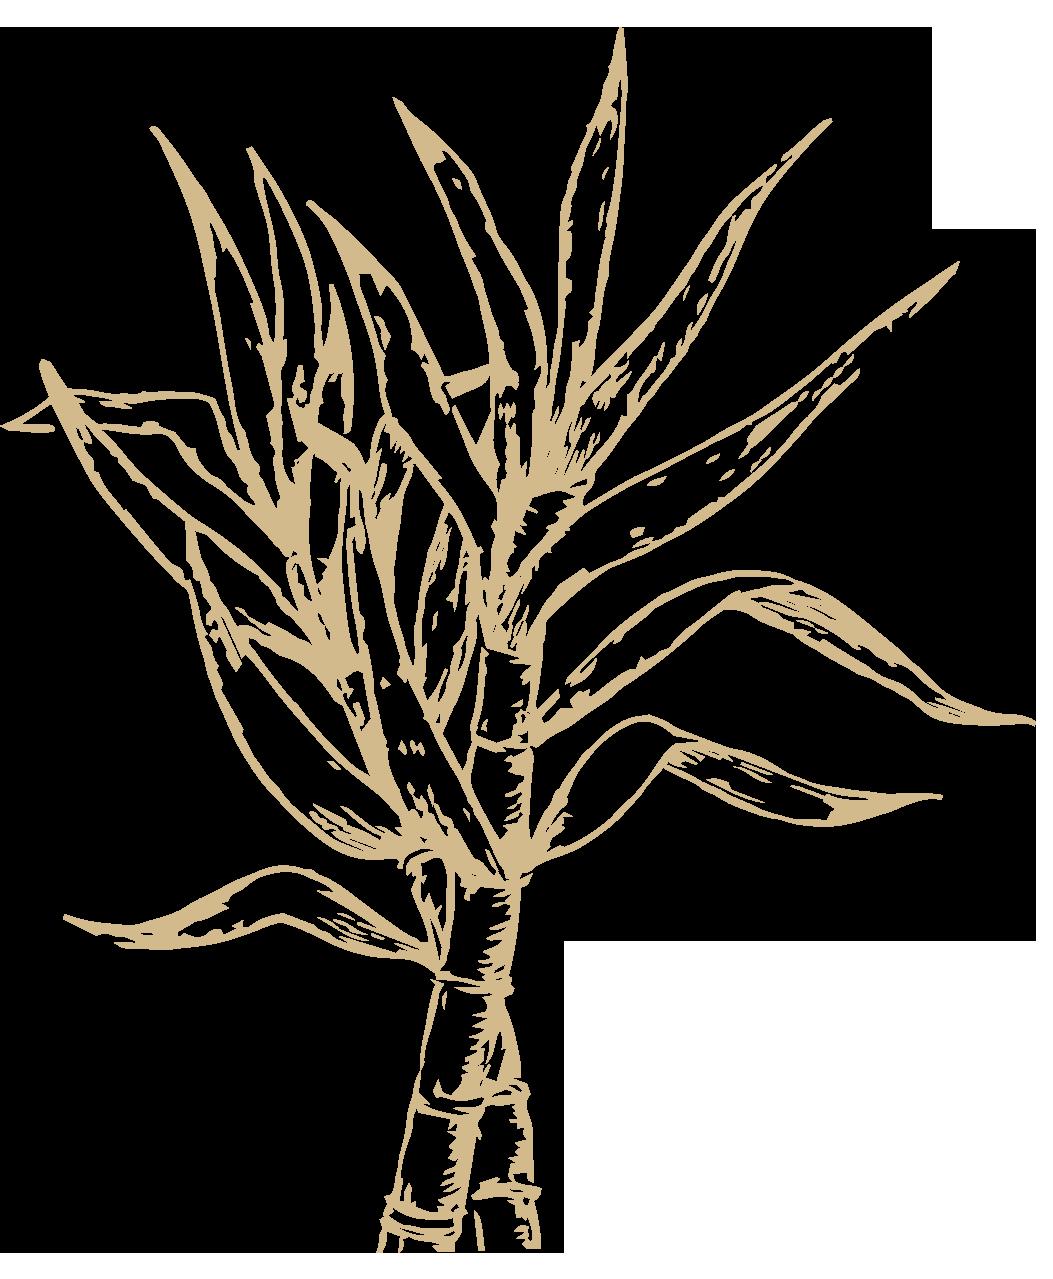 illustration of a sugar cane plant